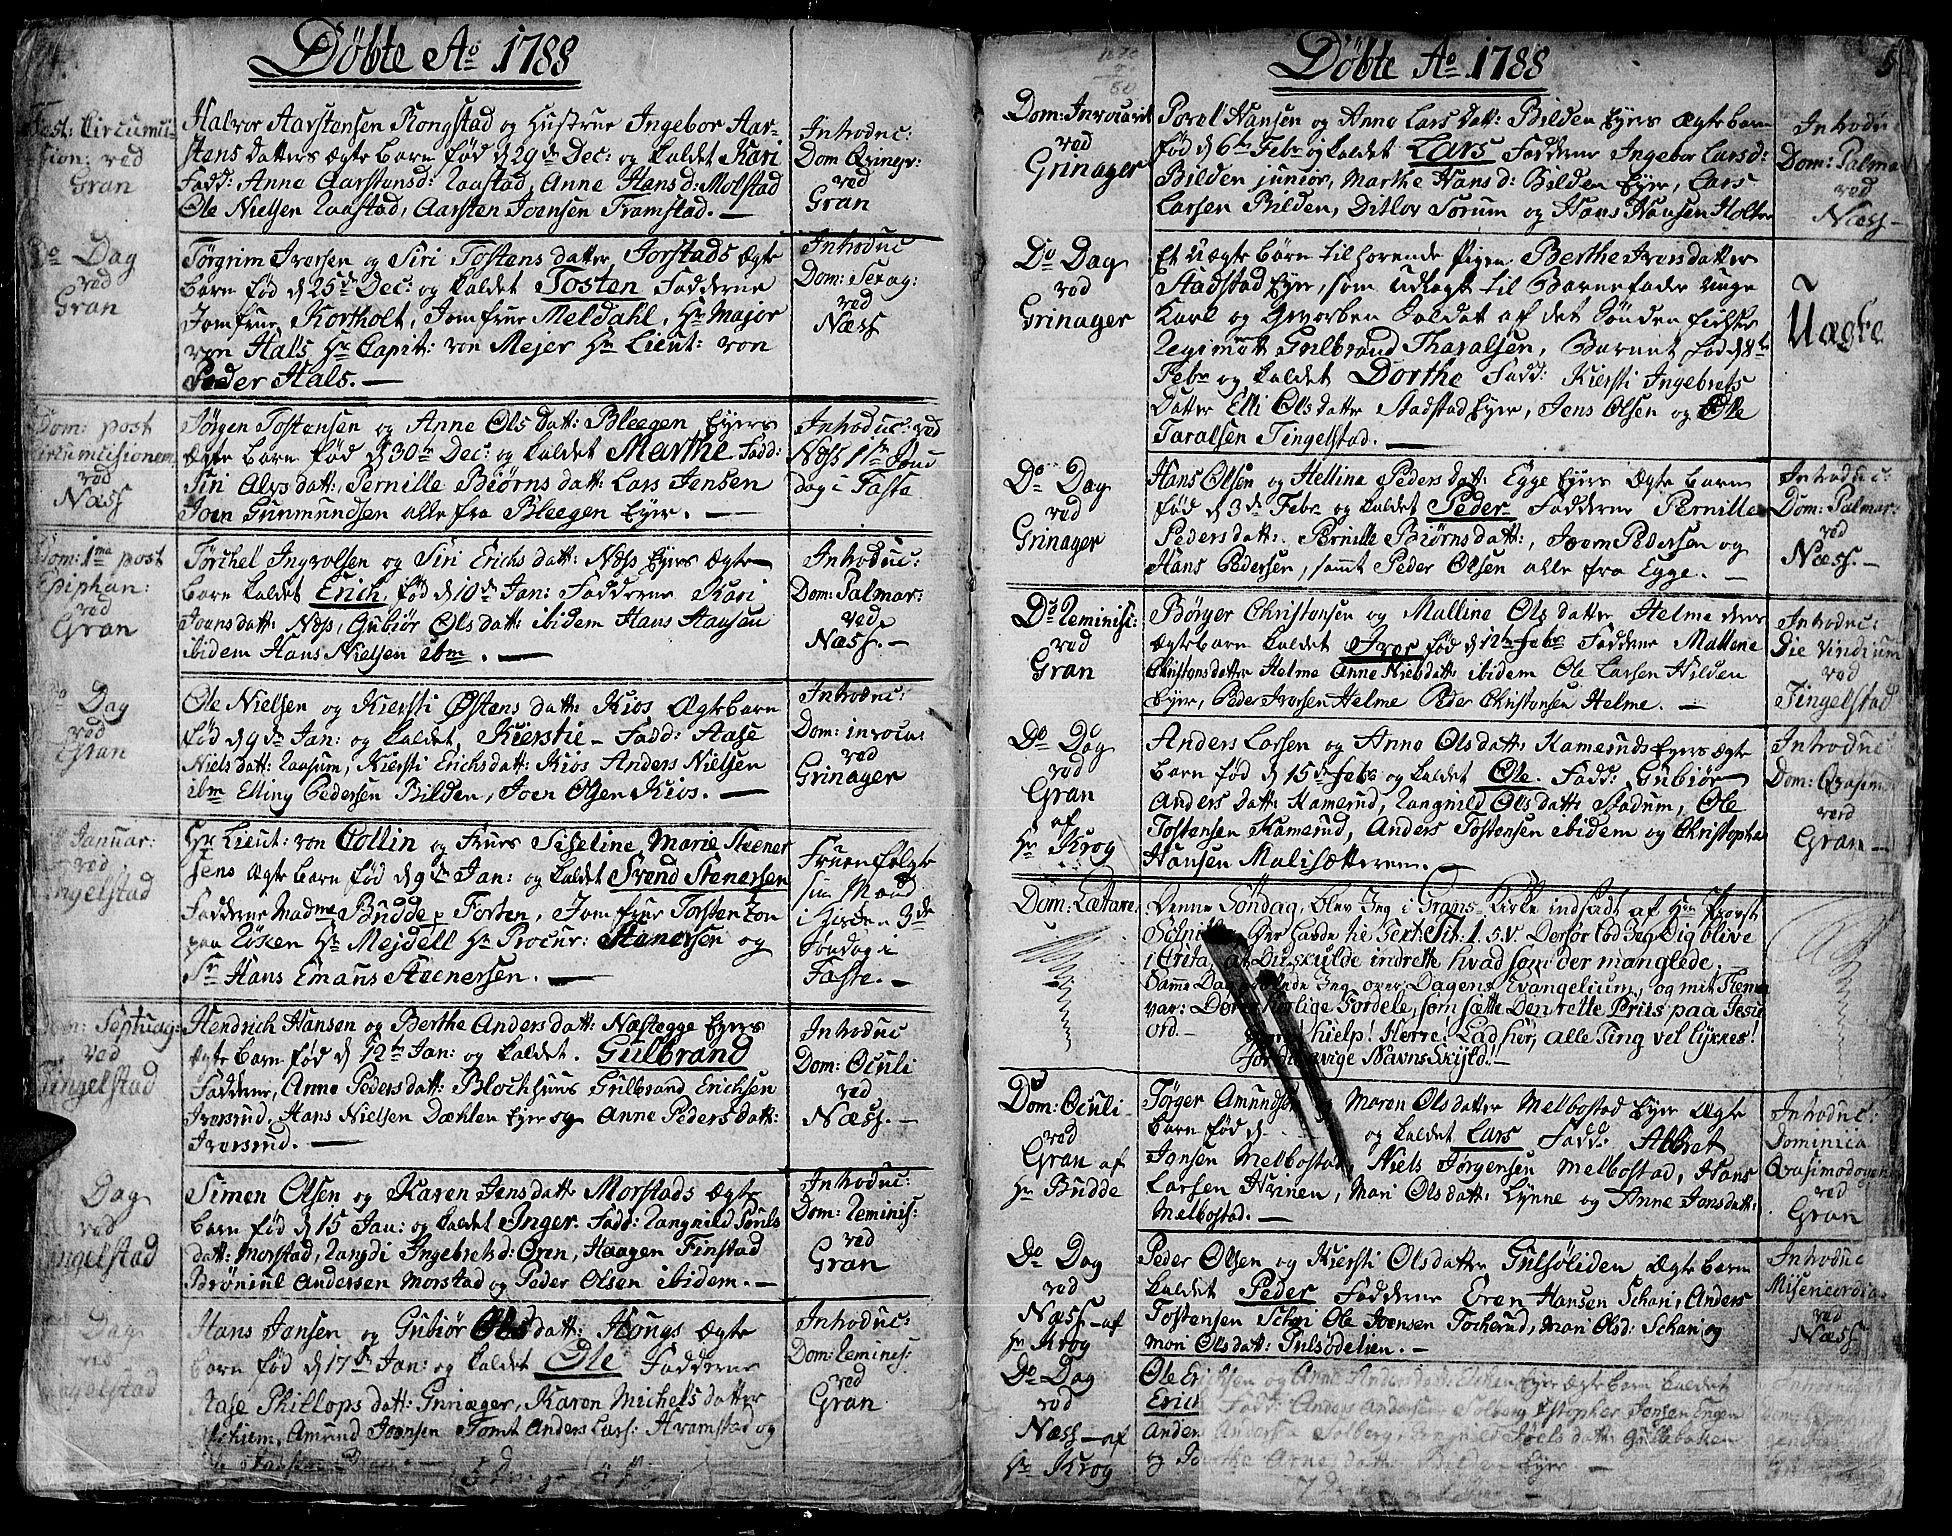 SAH, Gran prestekontor, Ministerialbok nr. 6, 1787-1824, s. 4-5